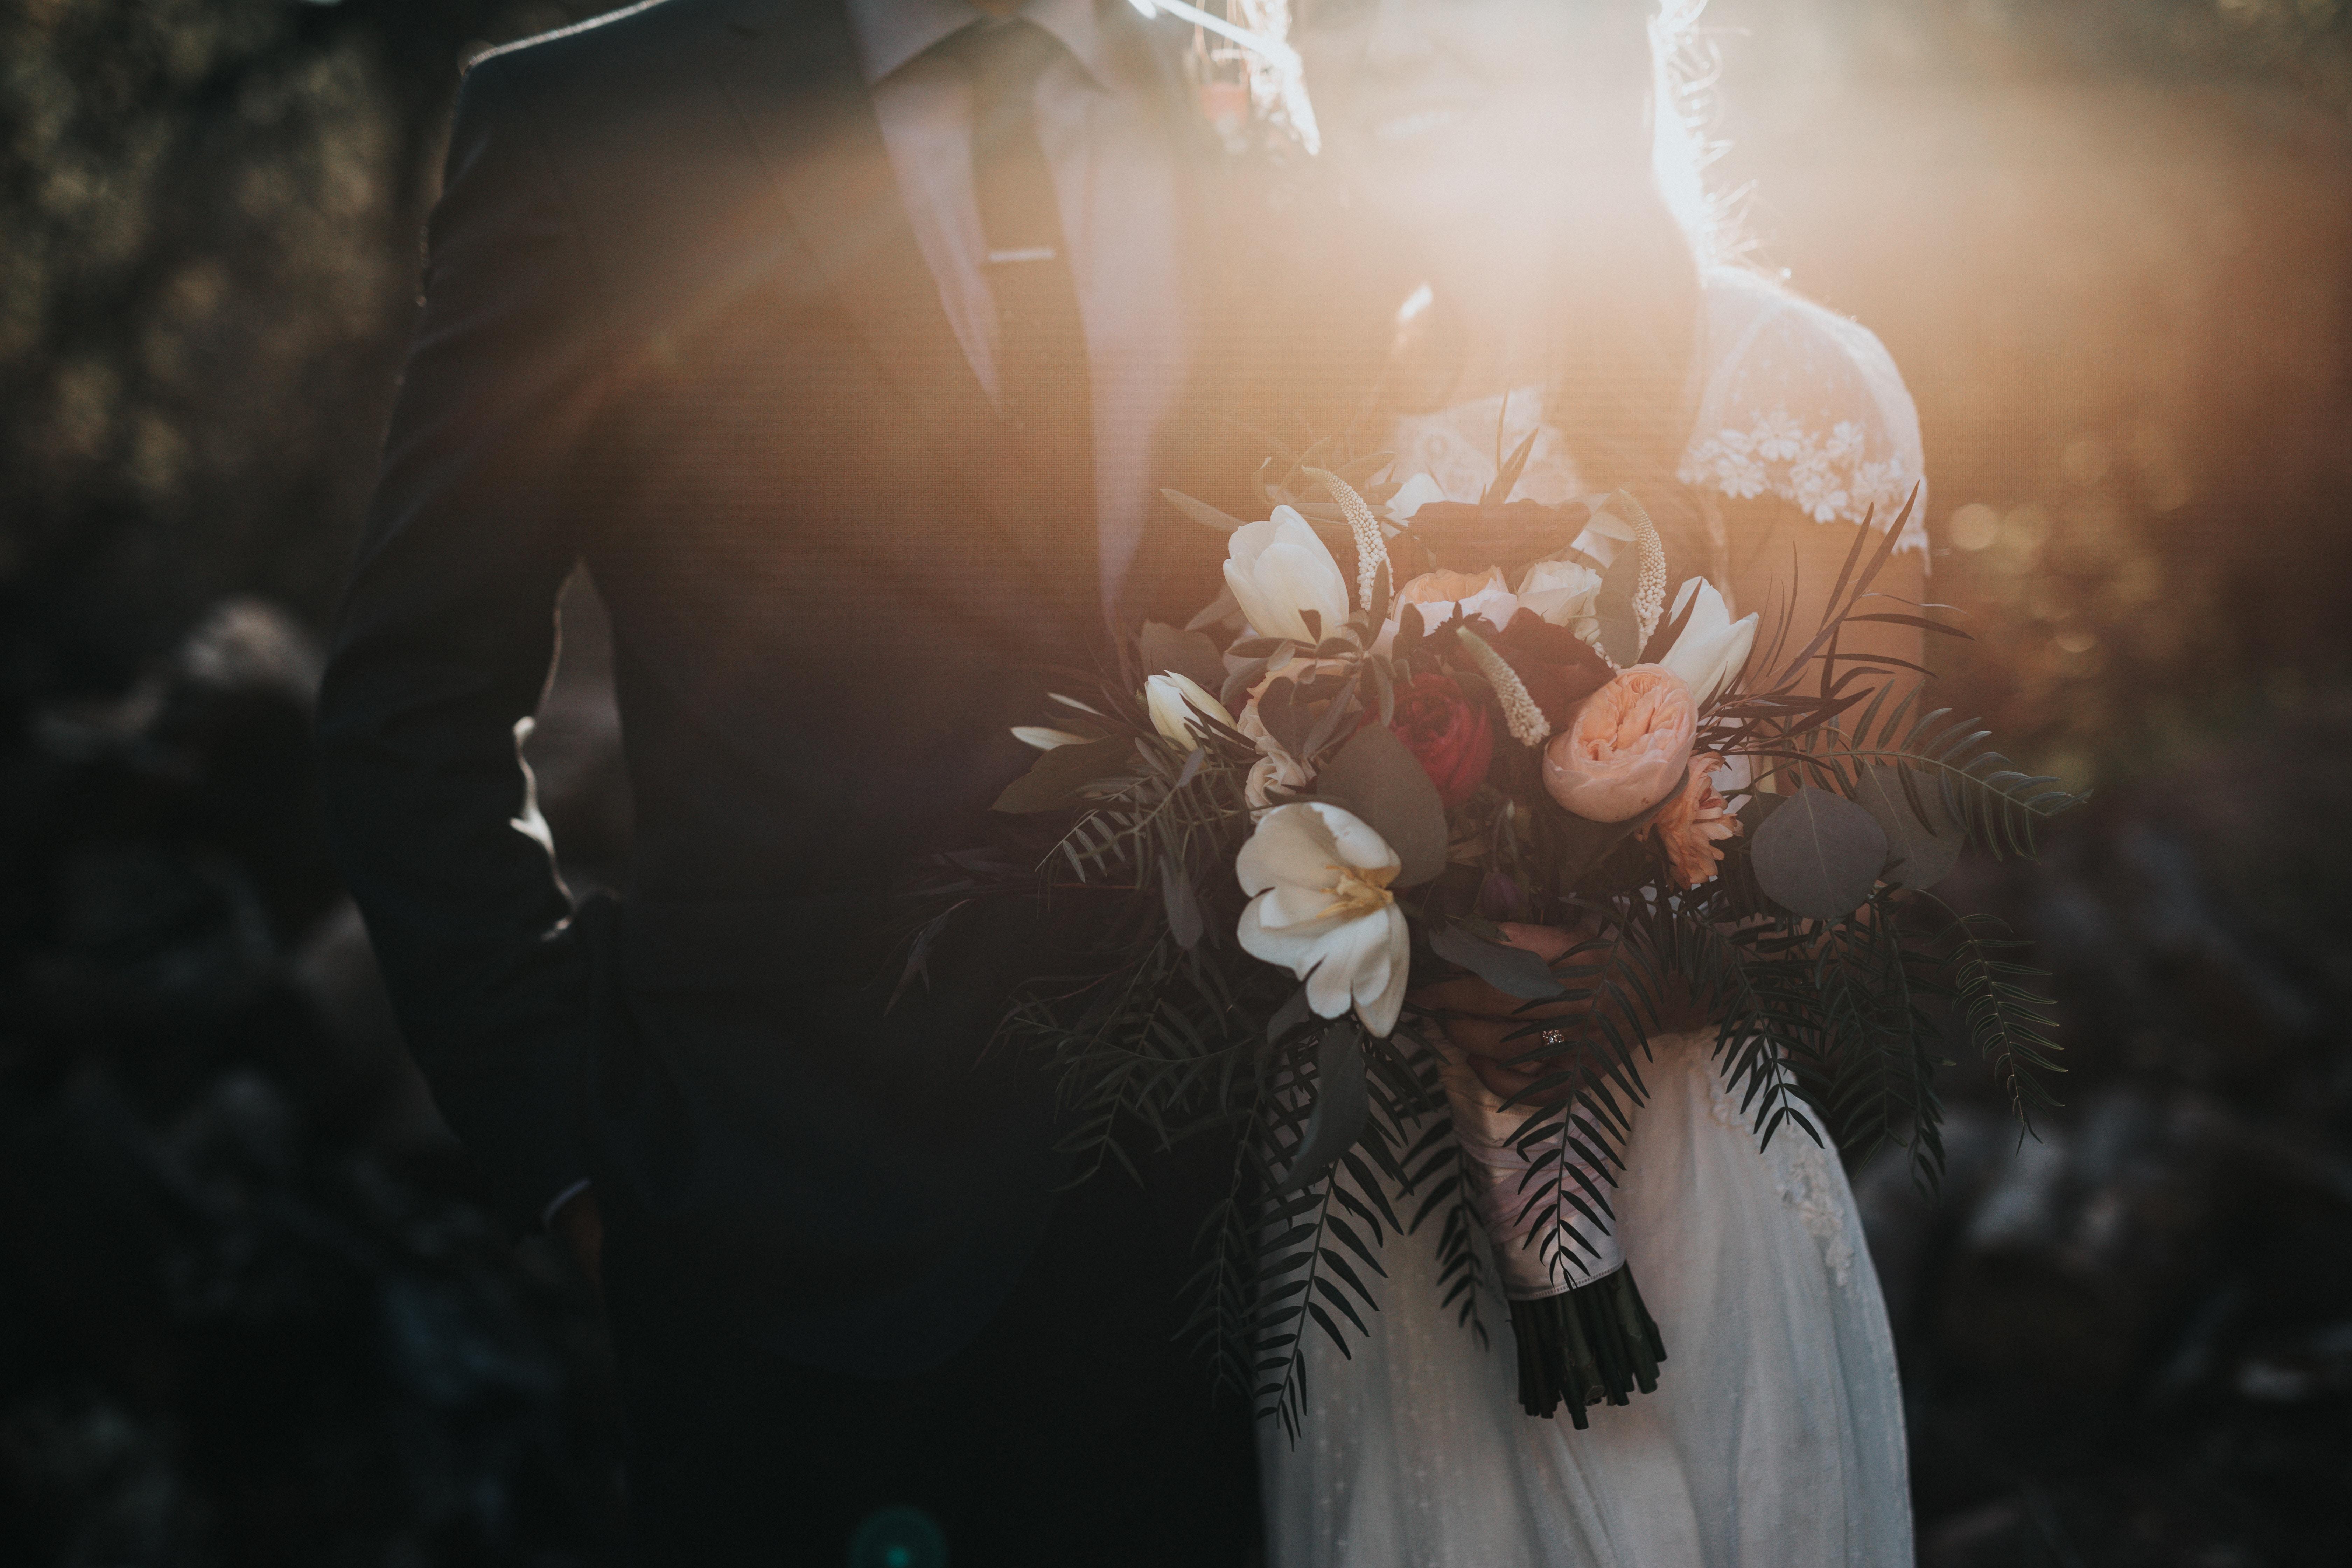 How To Design Your Amazing Wedding Album